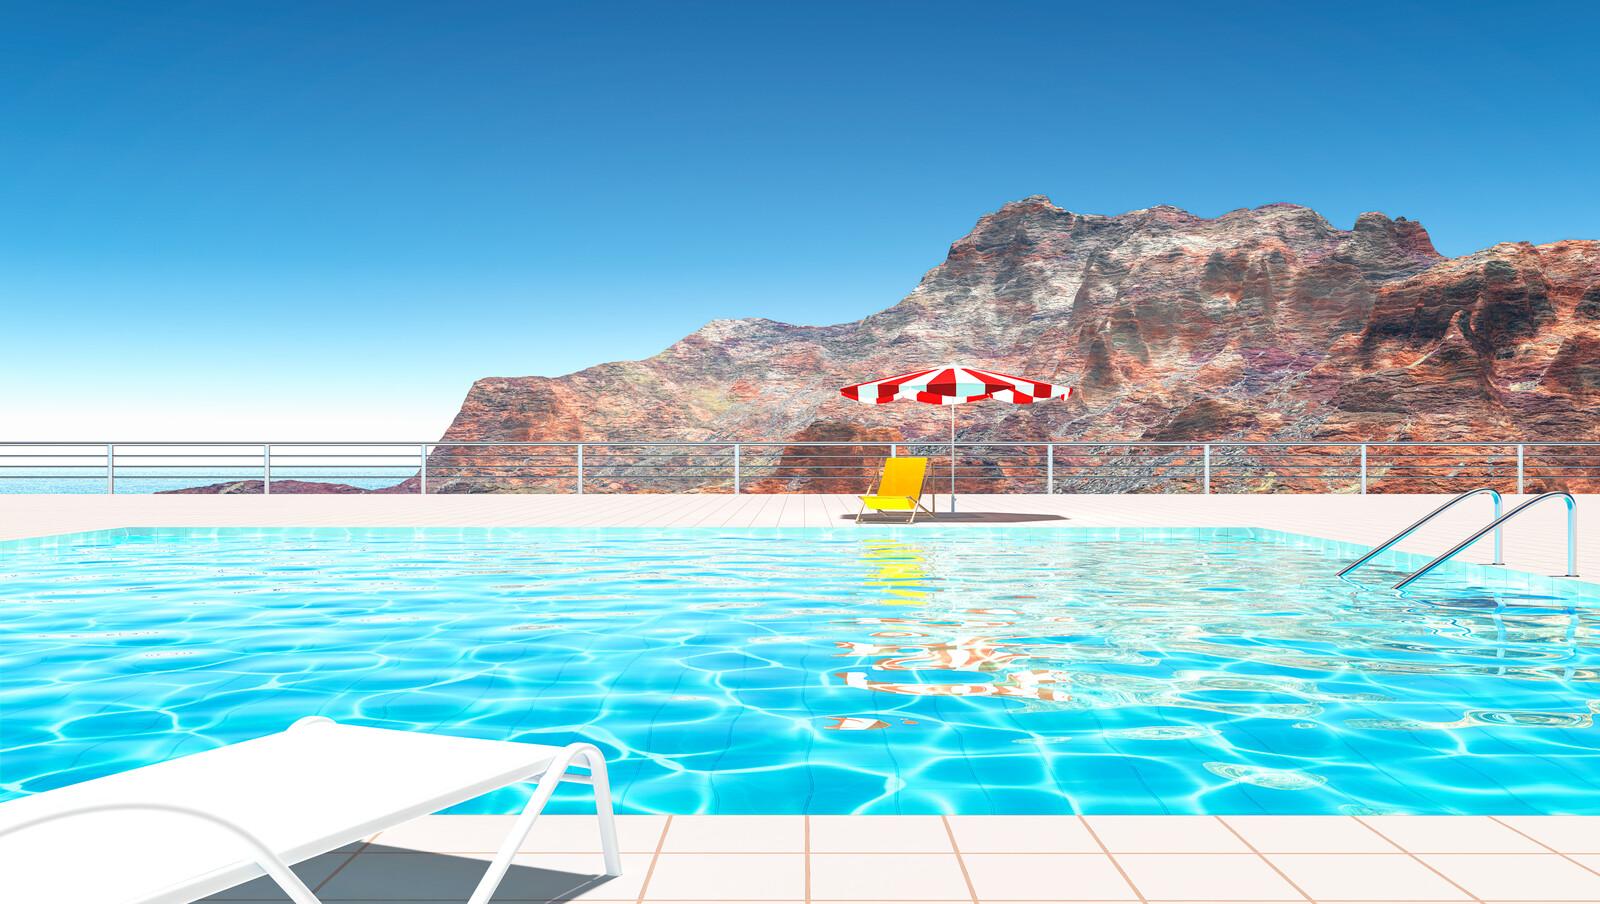 Pool 35 - Carl Miller